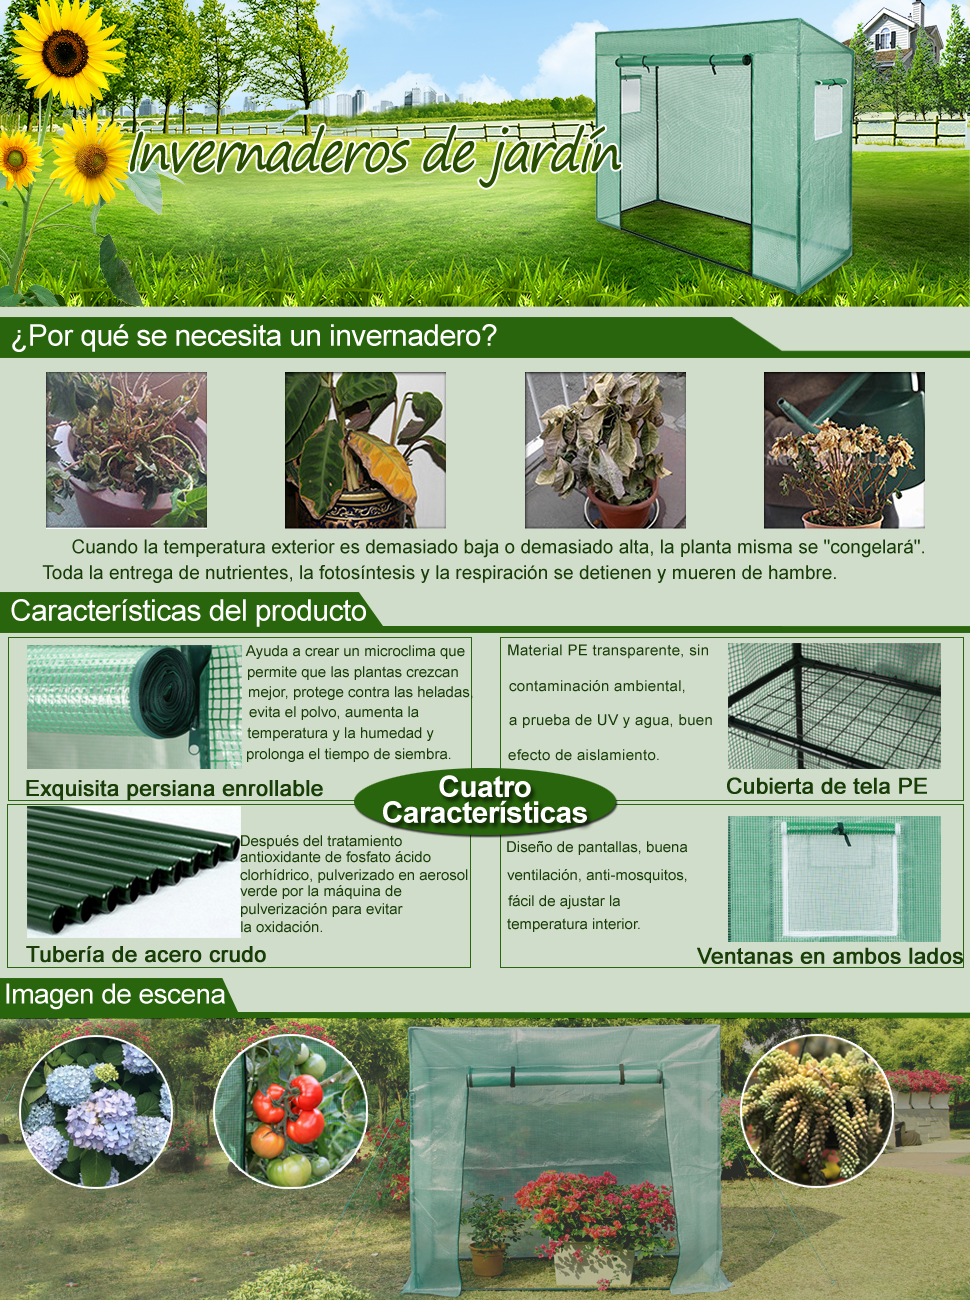 Yorbay Invernadero de Jardín con Pantalla Rejilla de PE (140g/㎡), para Tomates, Terraza, Verde, 200 x 80 x 170/150 cm